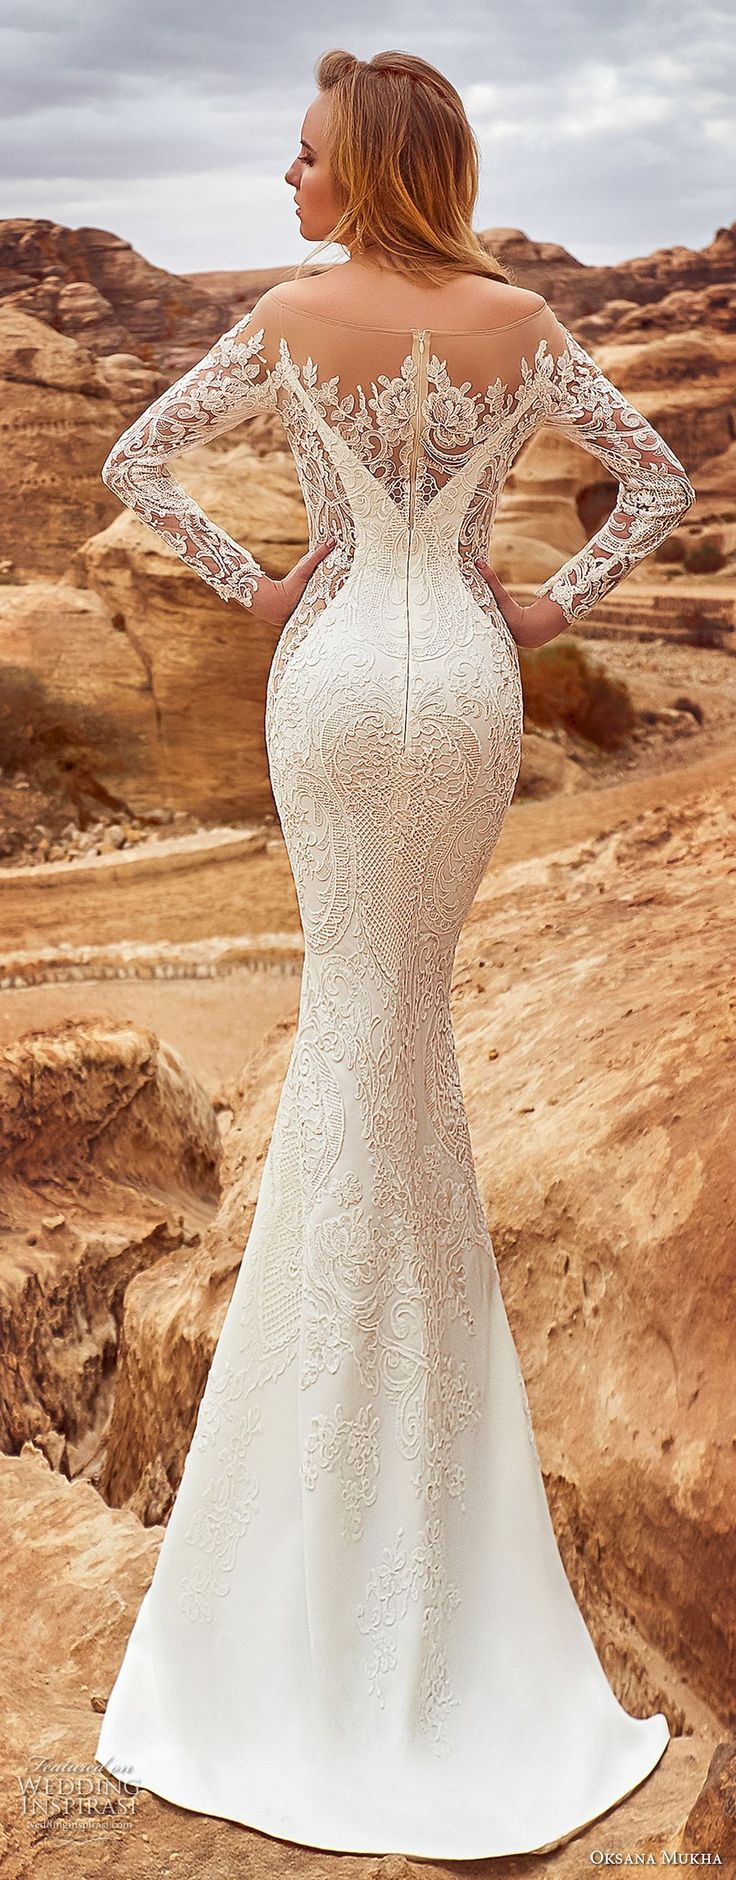 Best Sleeve Wedding Dresses Ideas On Pinterest Lace Sleeve